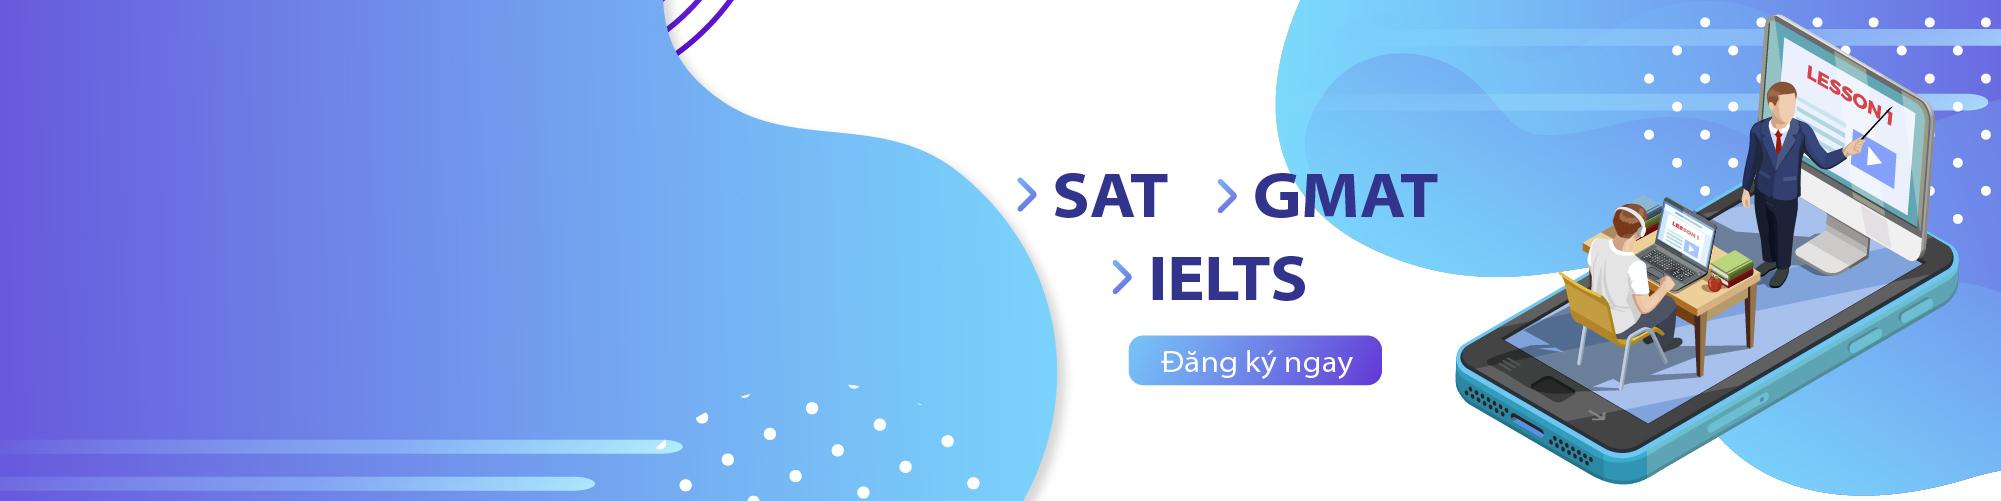 Học SAT, IELTS, GMAT trực tuyến cùng Clever Academy®